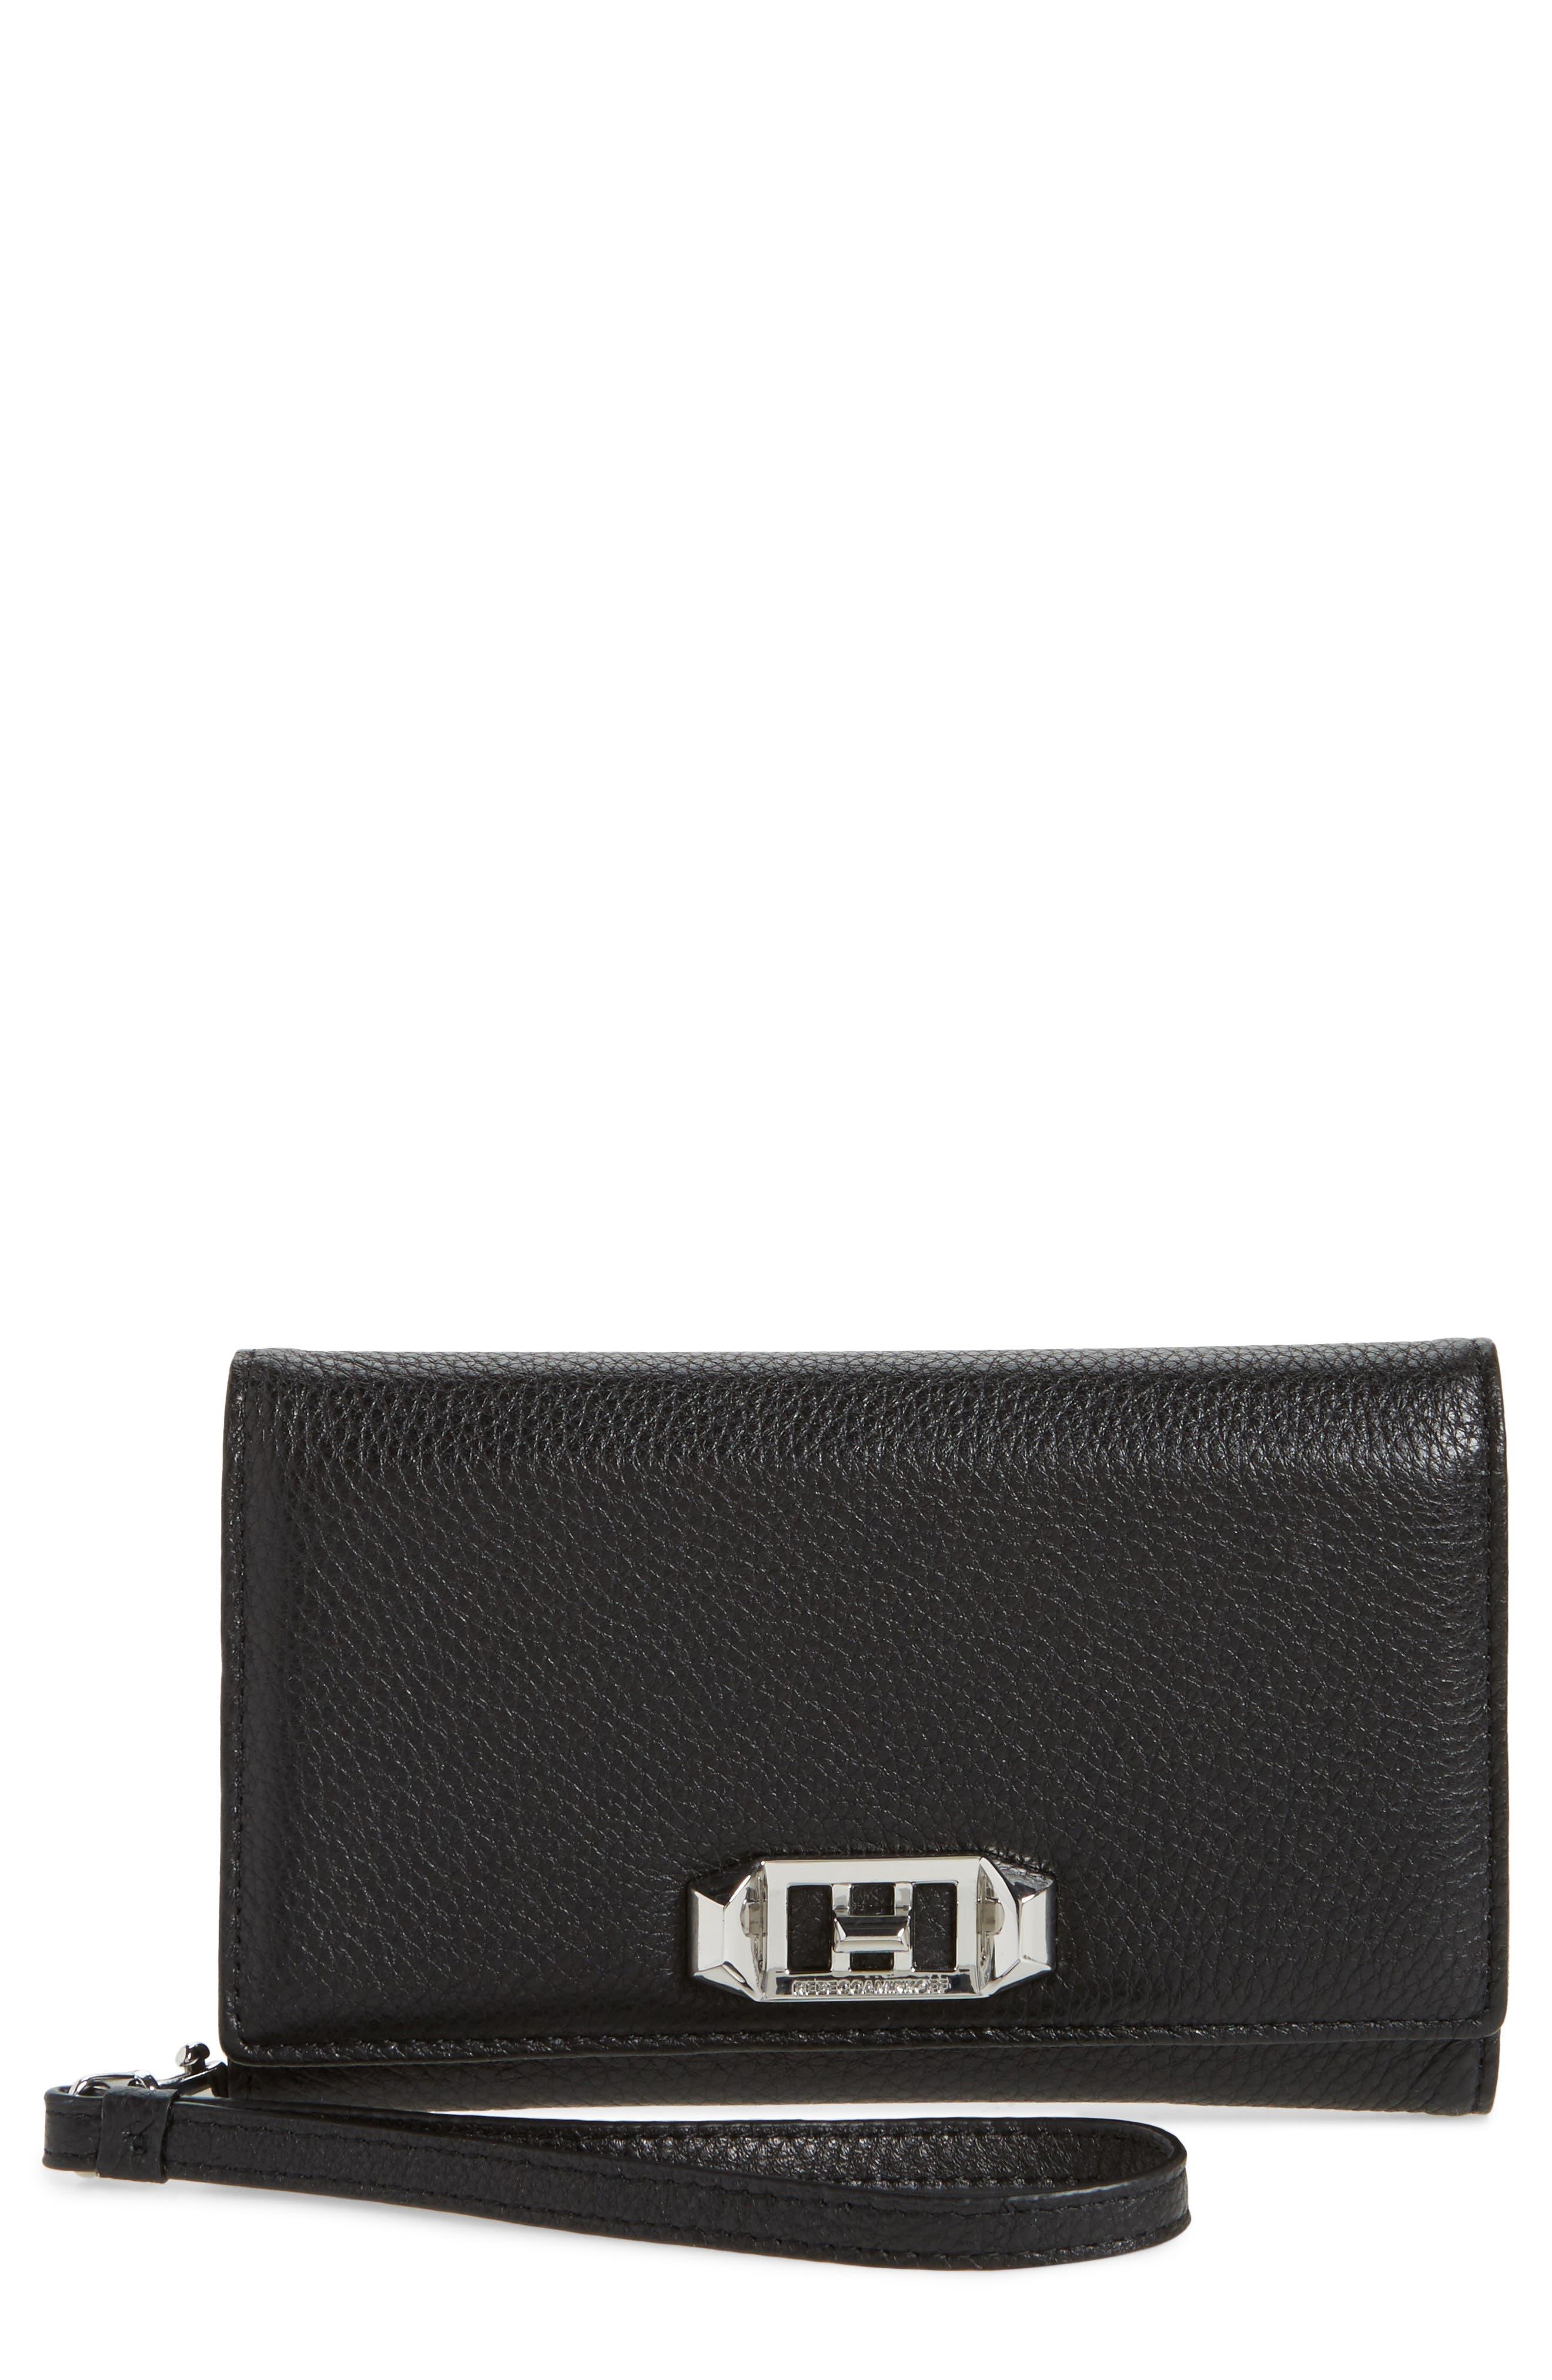 REBECCA MINKOFF,                             Love Lock iPhone 7/8 & 7/8 Plus Leather Wristlet Folio,                             Main thumbnail 1, color,                             001